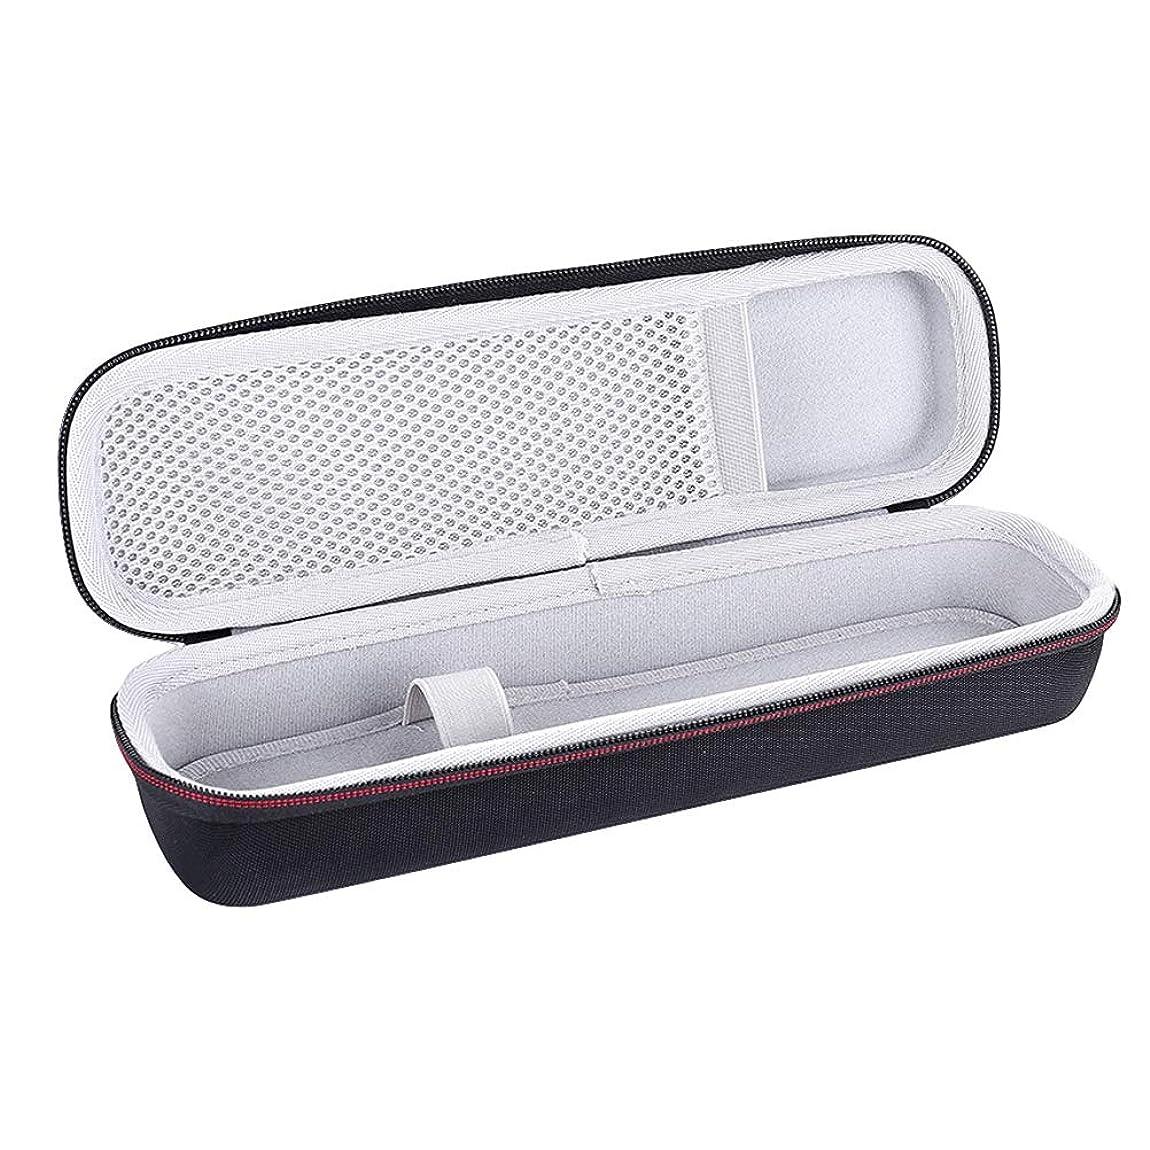 Healifty 電動歯ブラシケースポータブル圧縮抵抗保護歯ブラシ収納ケース屋外旅行用